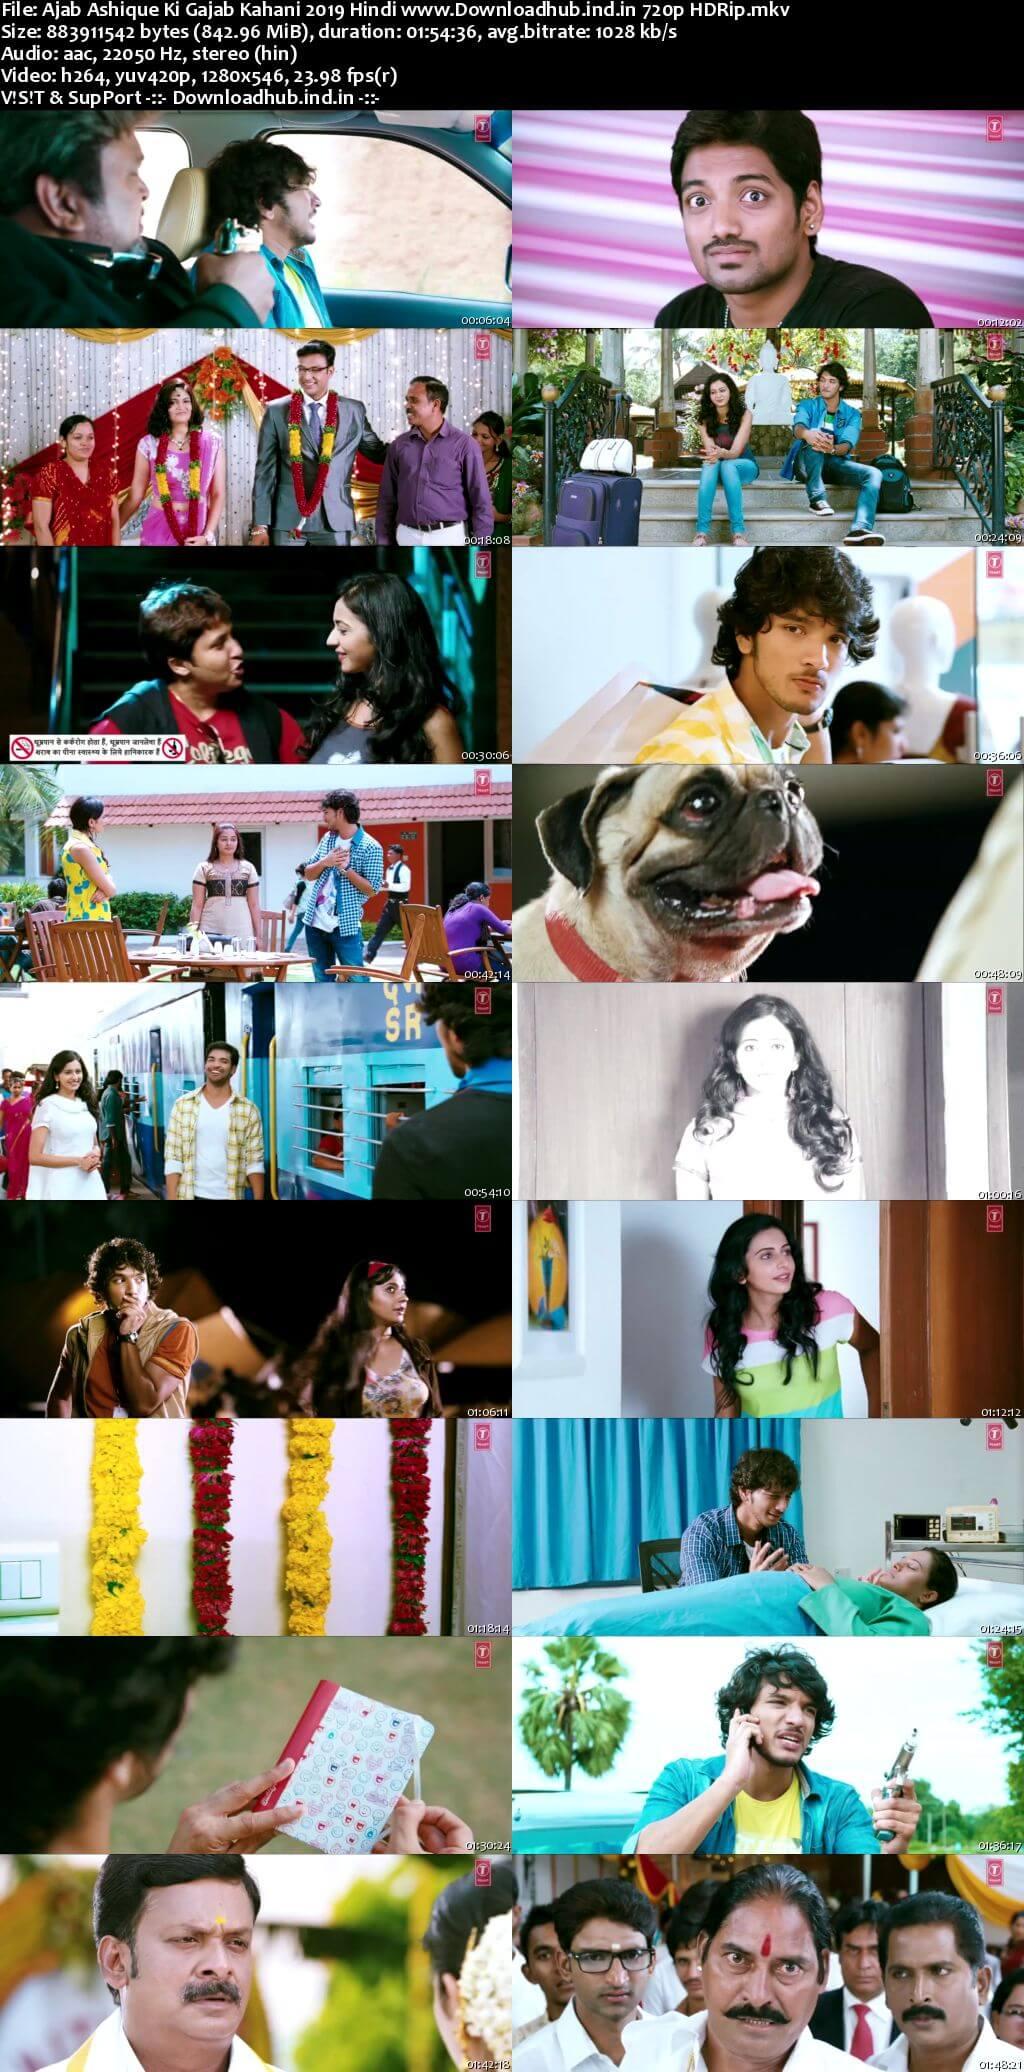 Ajab Ashique Ki Gajab Kahani 2019 Hindi Dubbed 720p HDRip x264